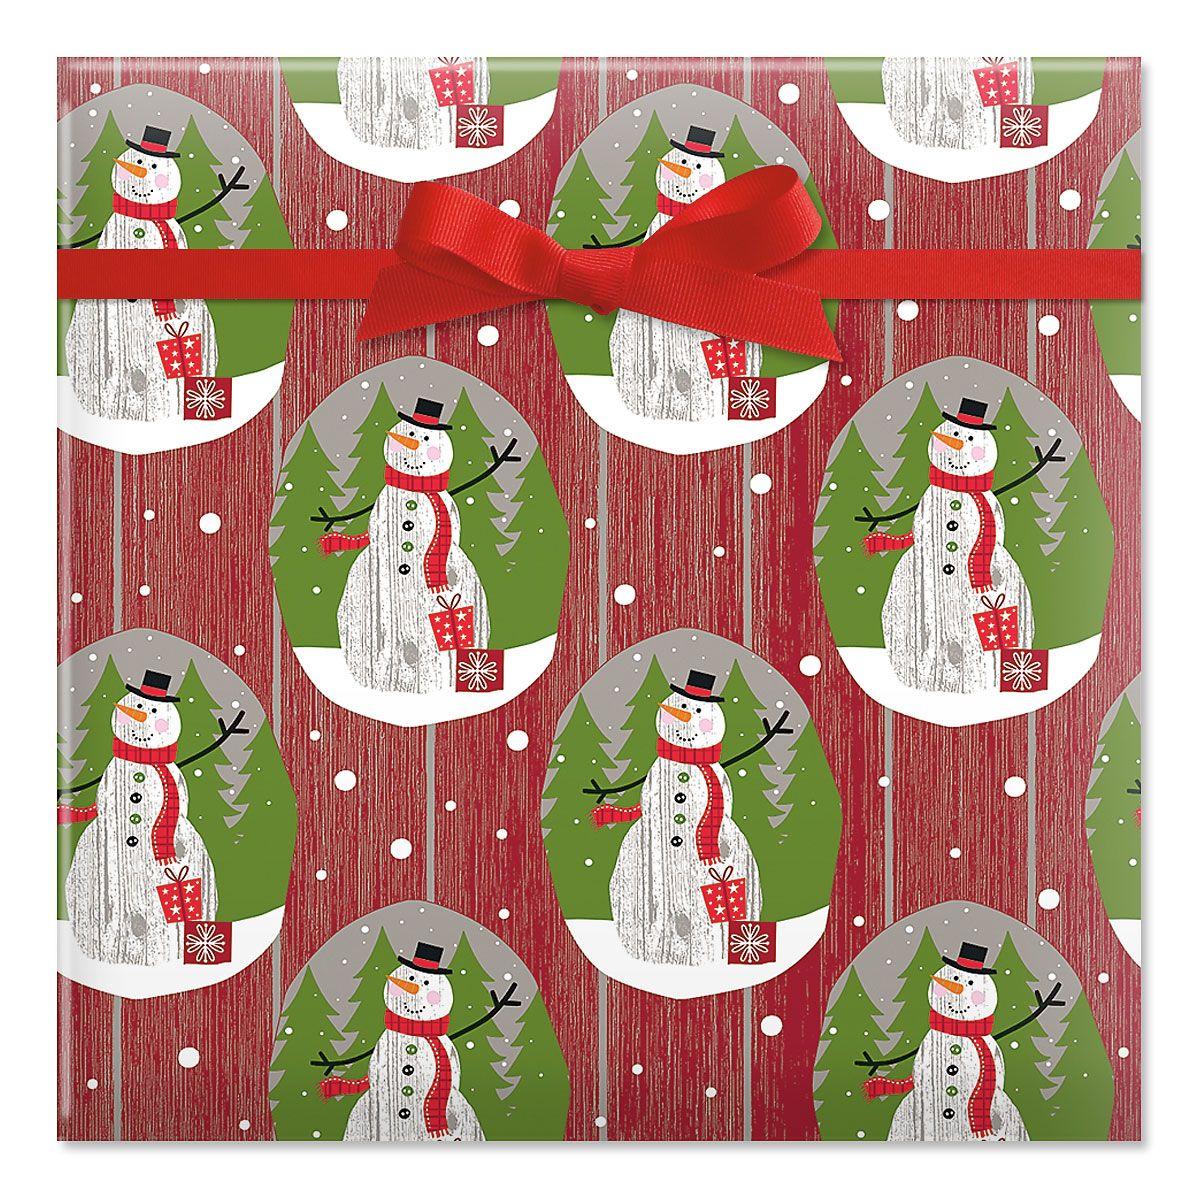 Wood Paneled Snowman Jumbo Rolled Gift Wrap